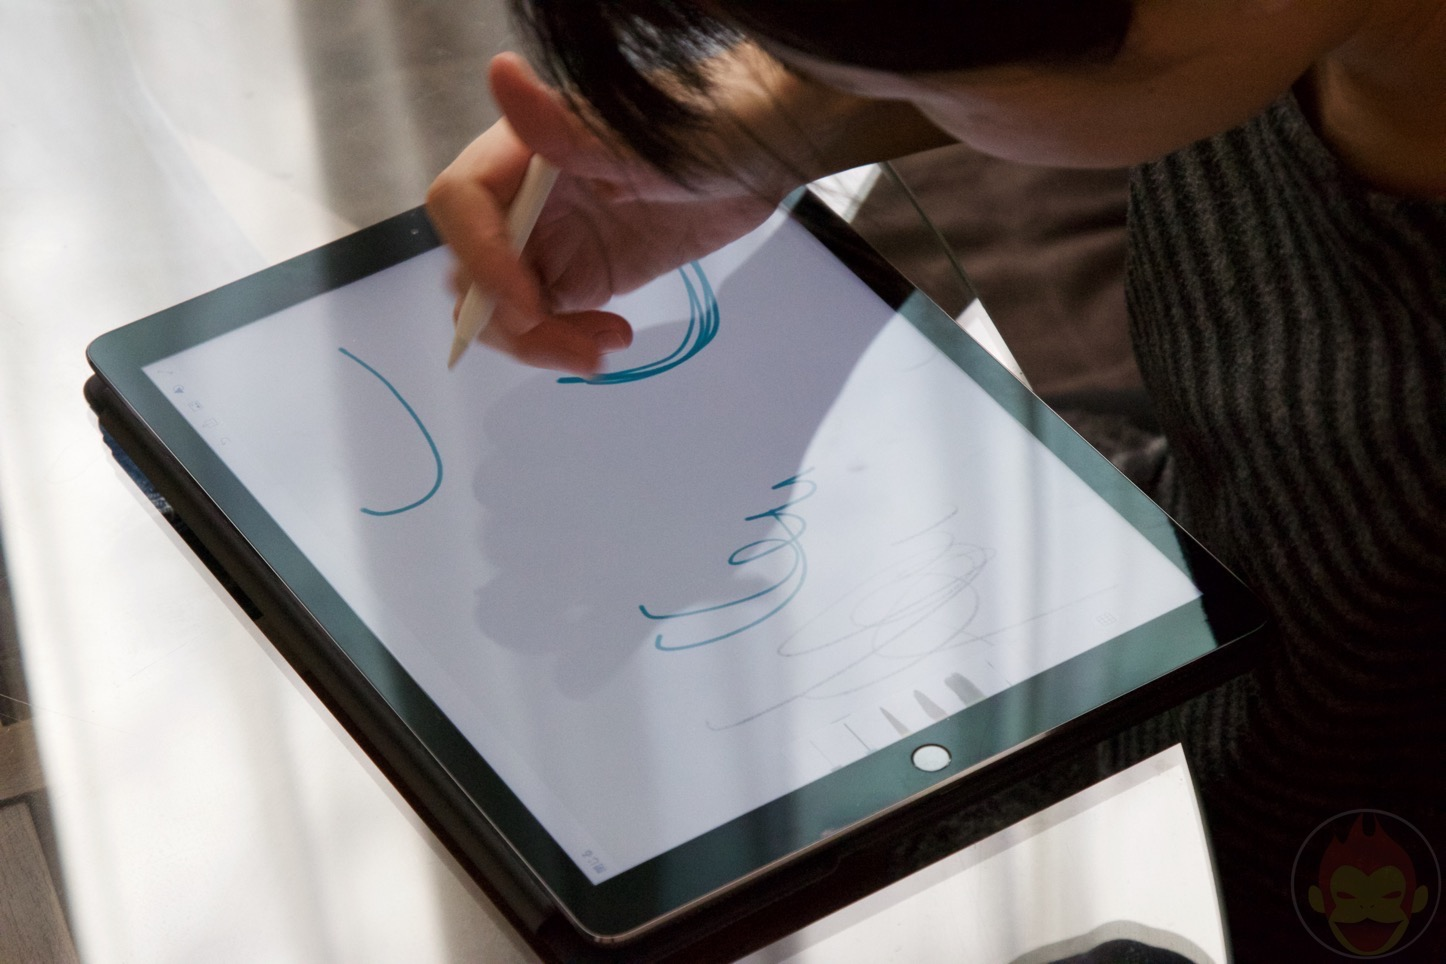 iPad-Pro-Apple-Pencil-Omochiland-61.jpg